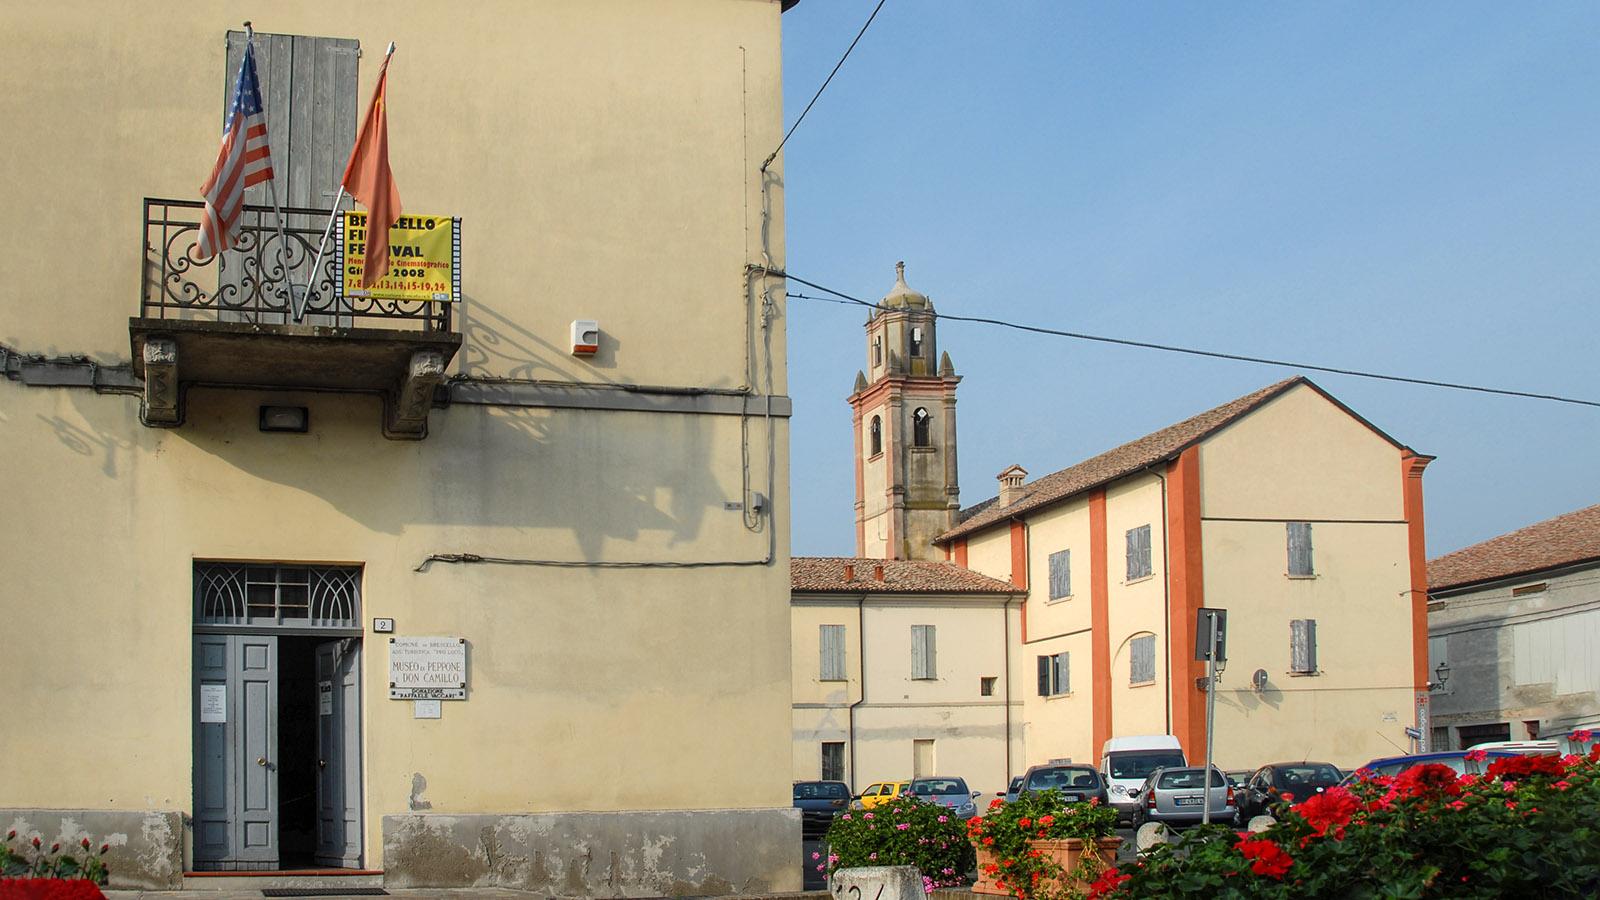 Das Don Camillo und Peppone-Museum von Brescello. Foto: Hilke Maunder